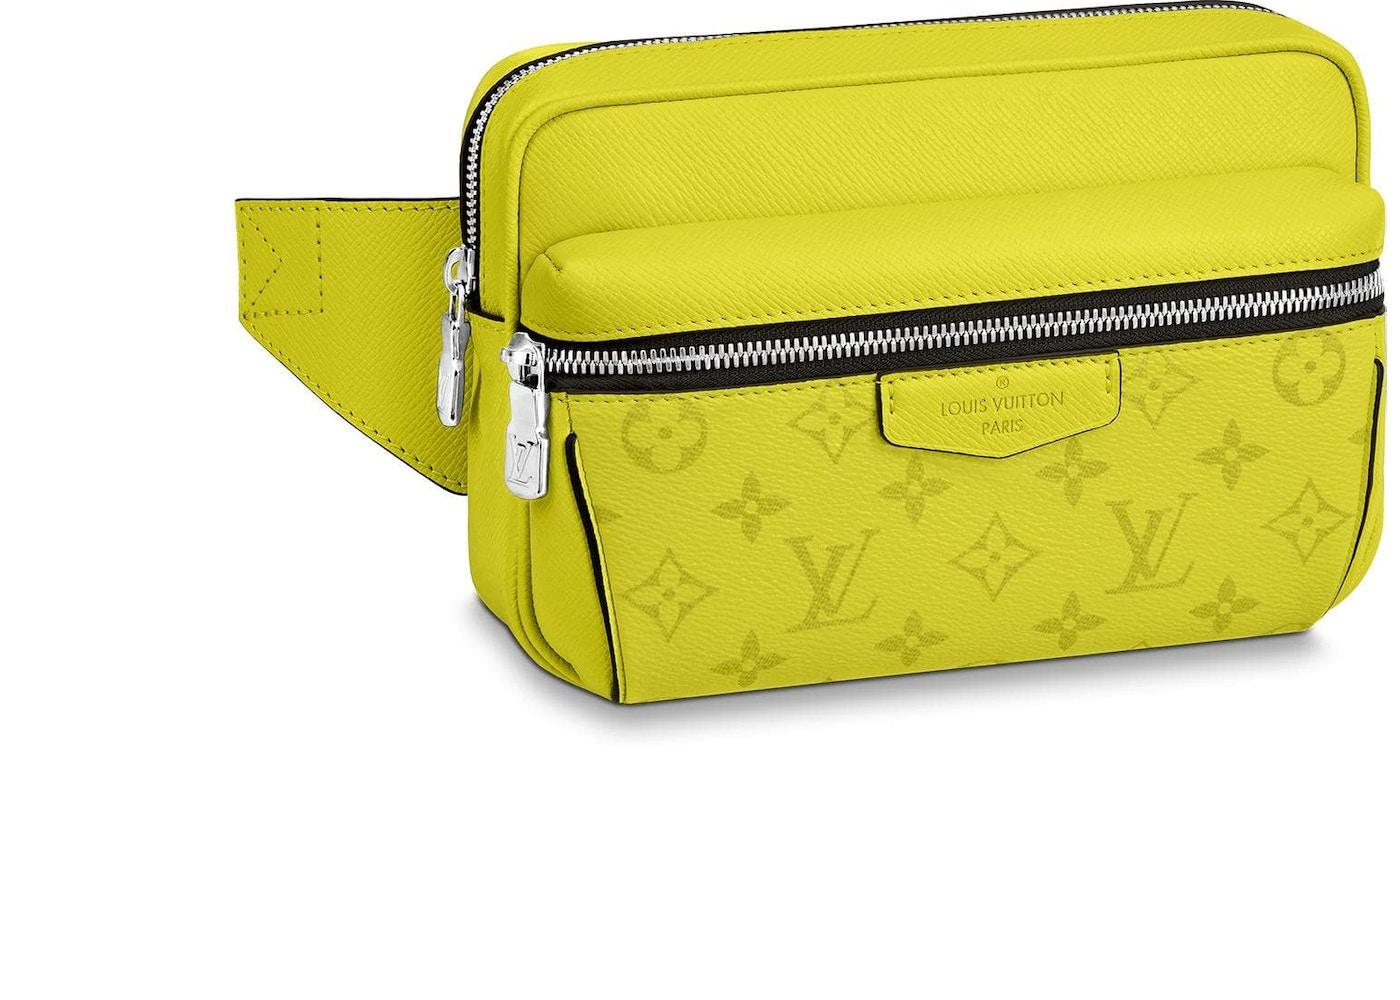 0ca9aee8b12c Louis Vuitton Outdoor Bumbag Monogram Bahia Taiga Yellow